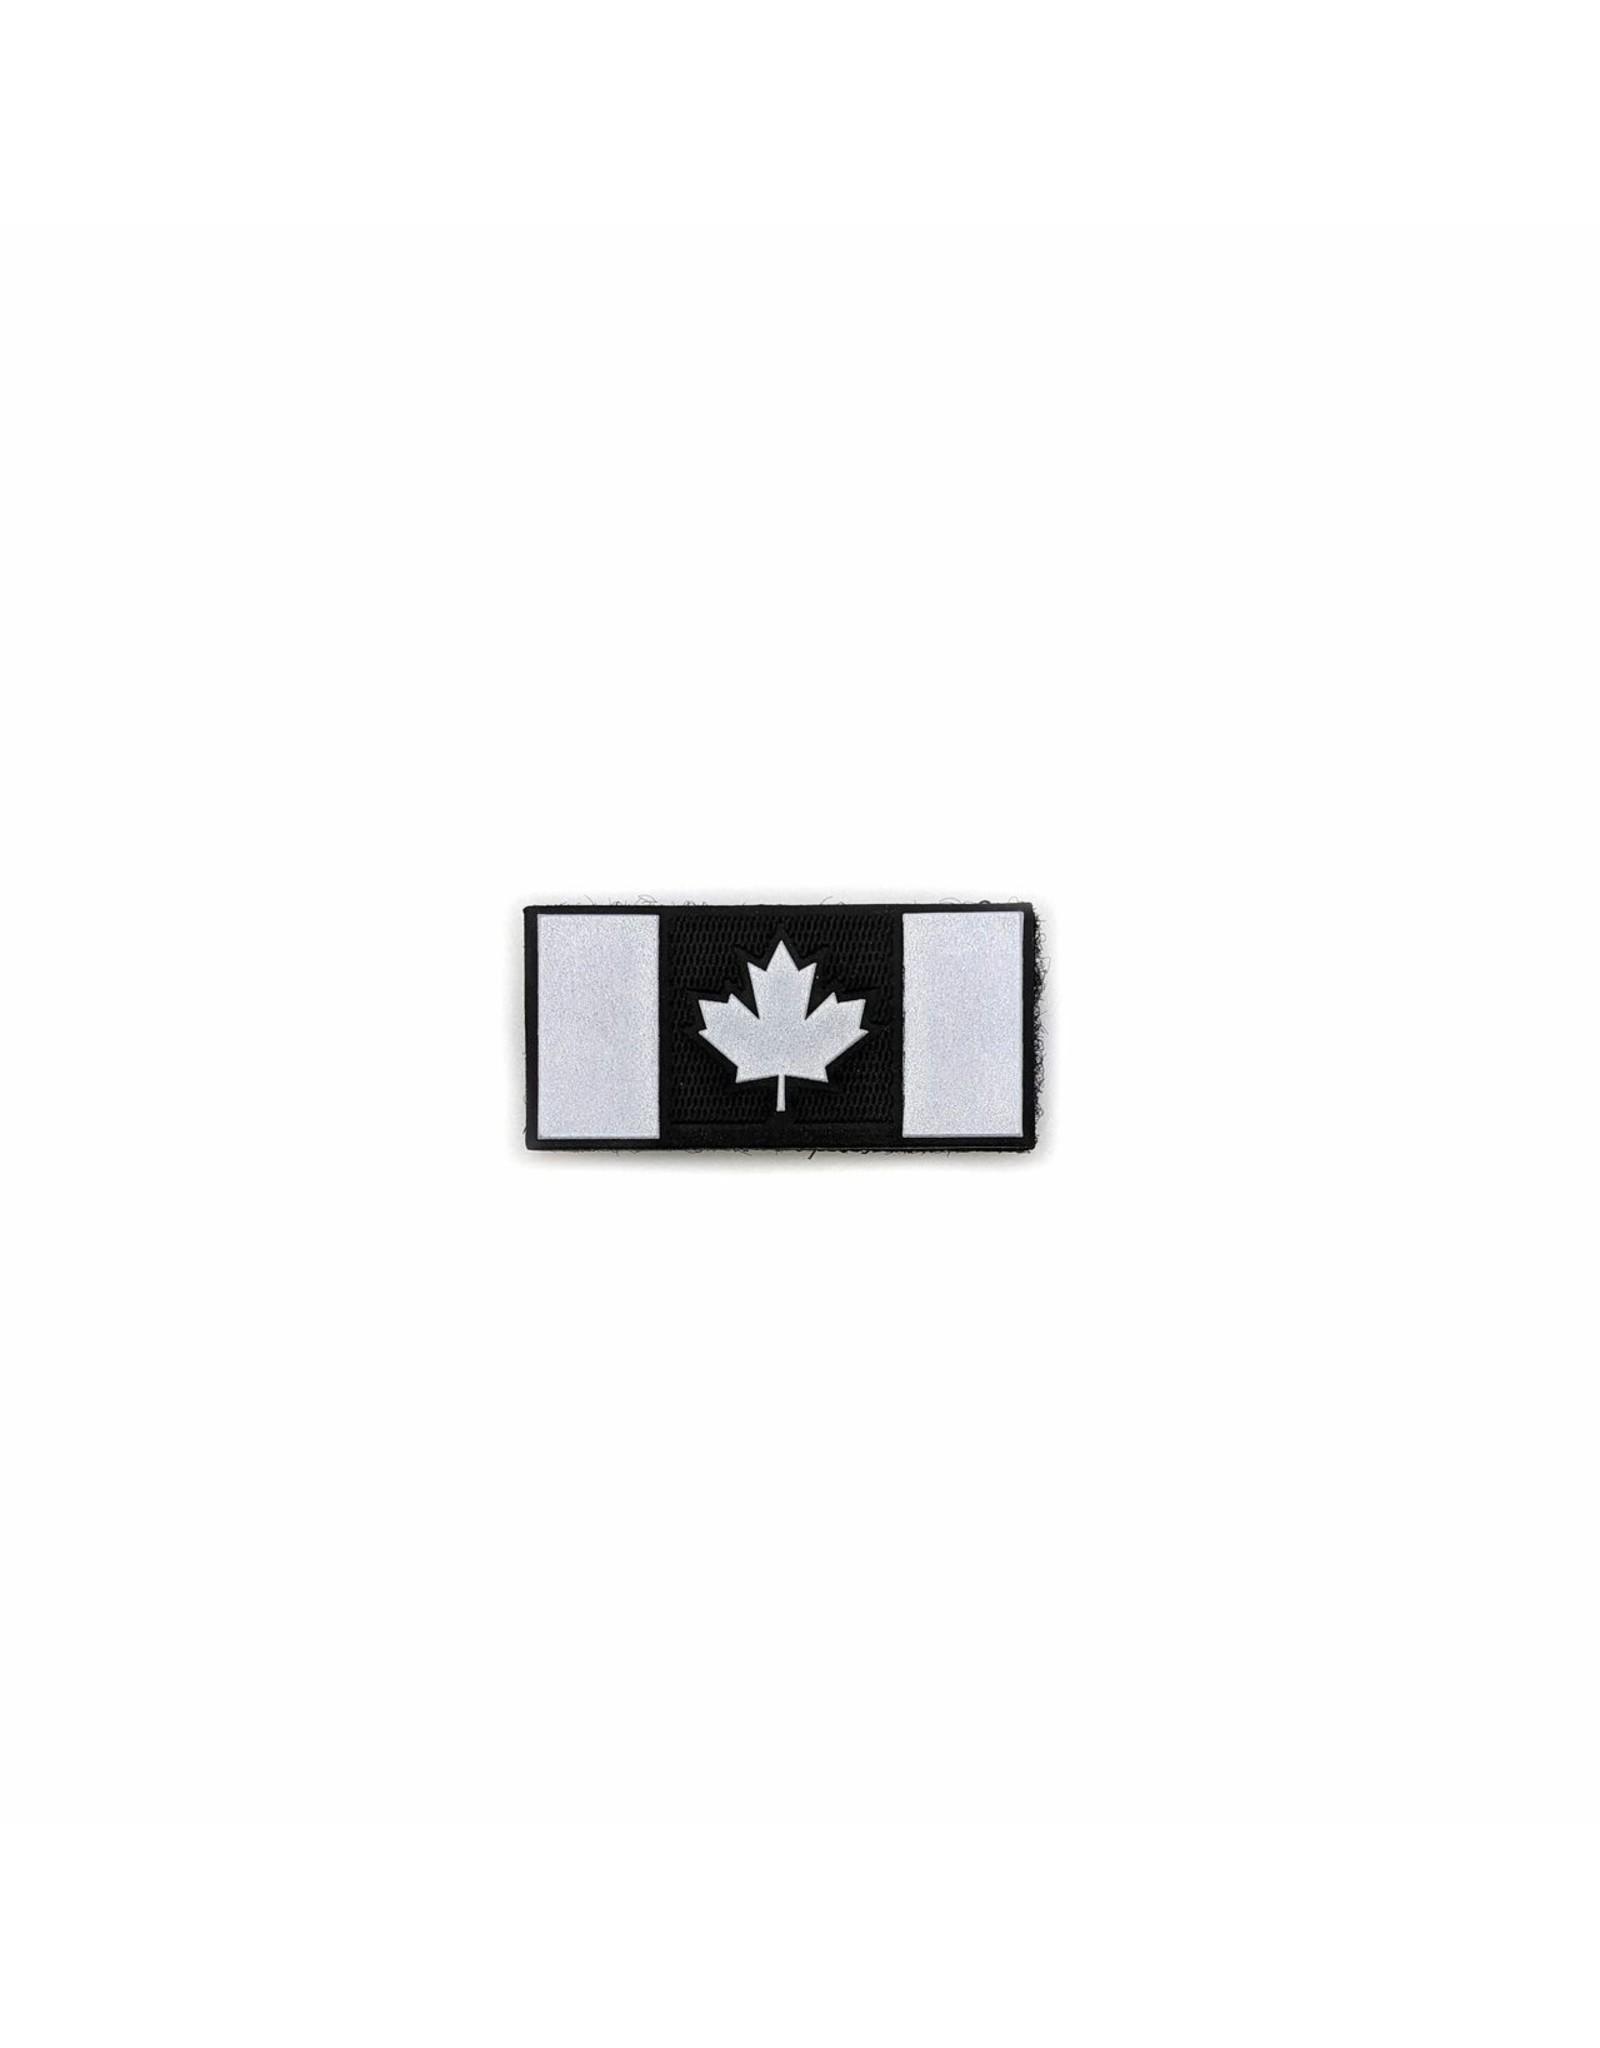 TIC Patch - Hi Vis Reflective Patch CANADA FLAG BLACK 1X2